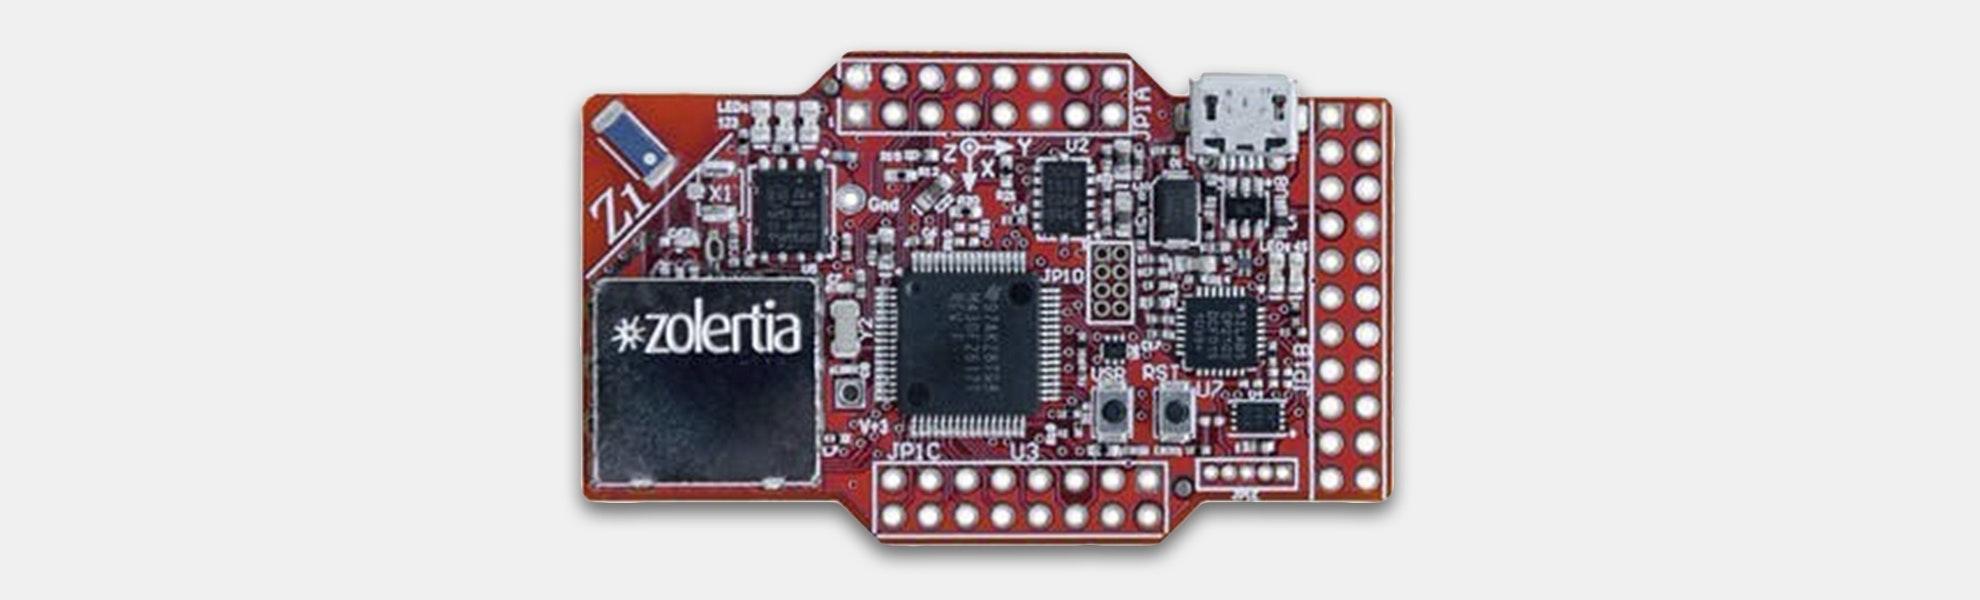 Zolertia Z1 Development Platform